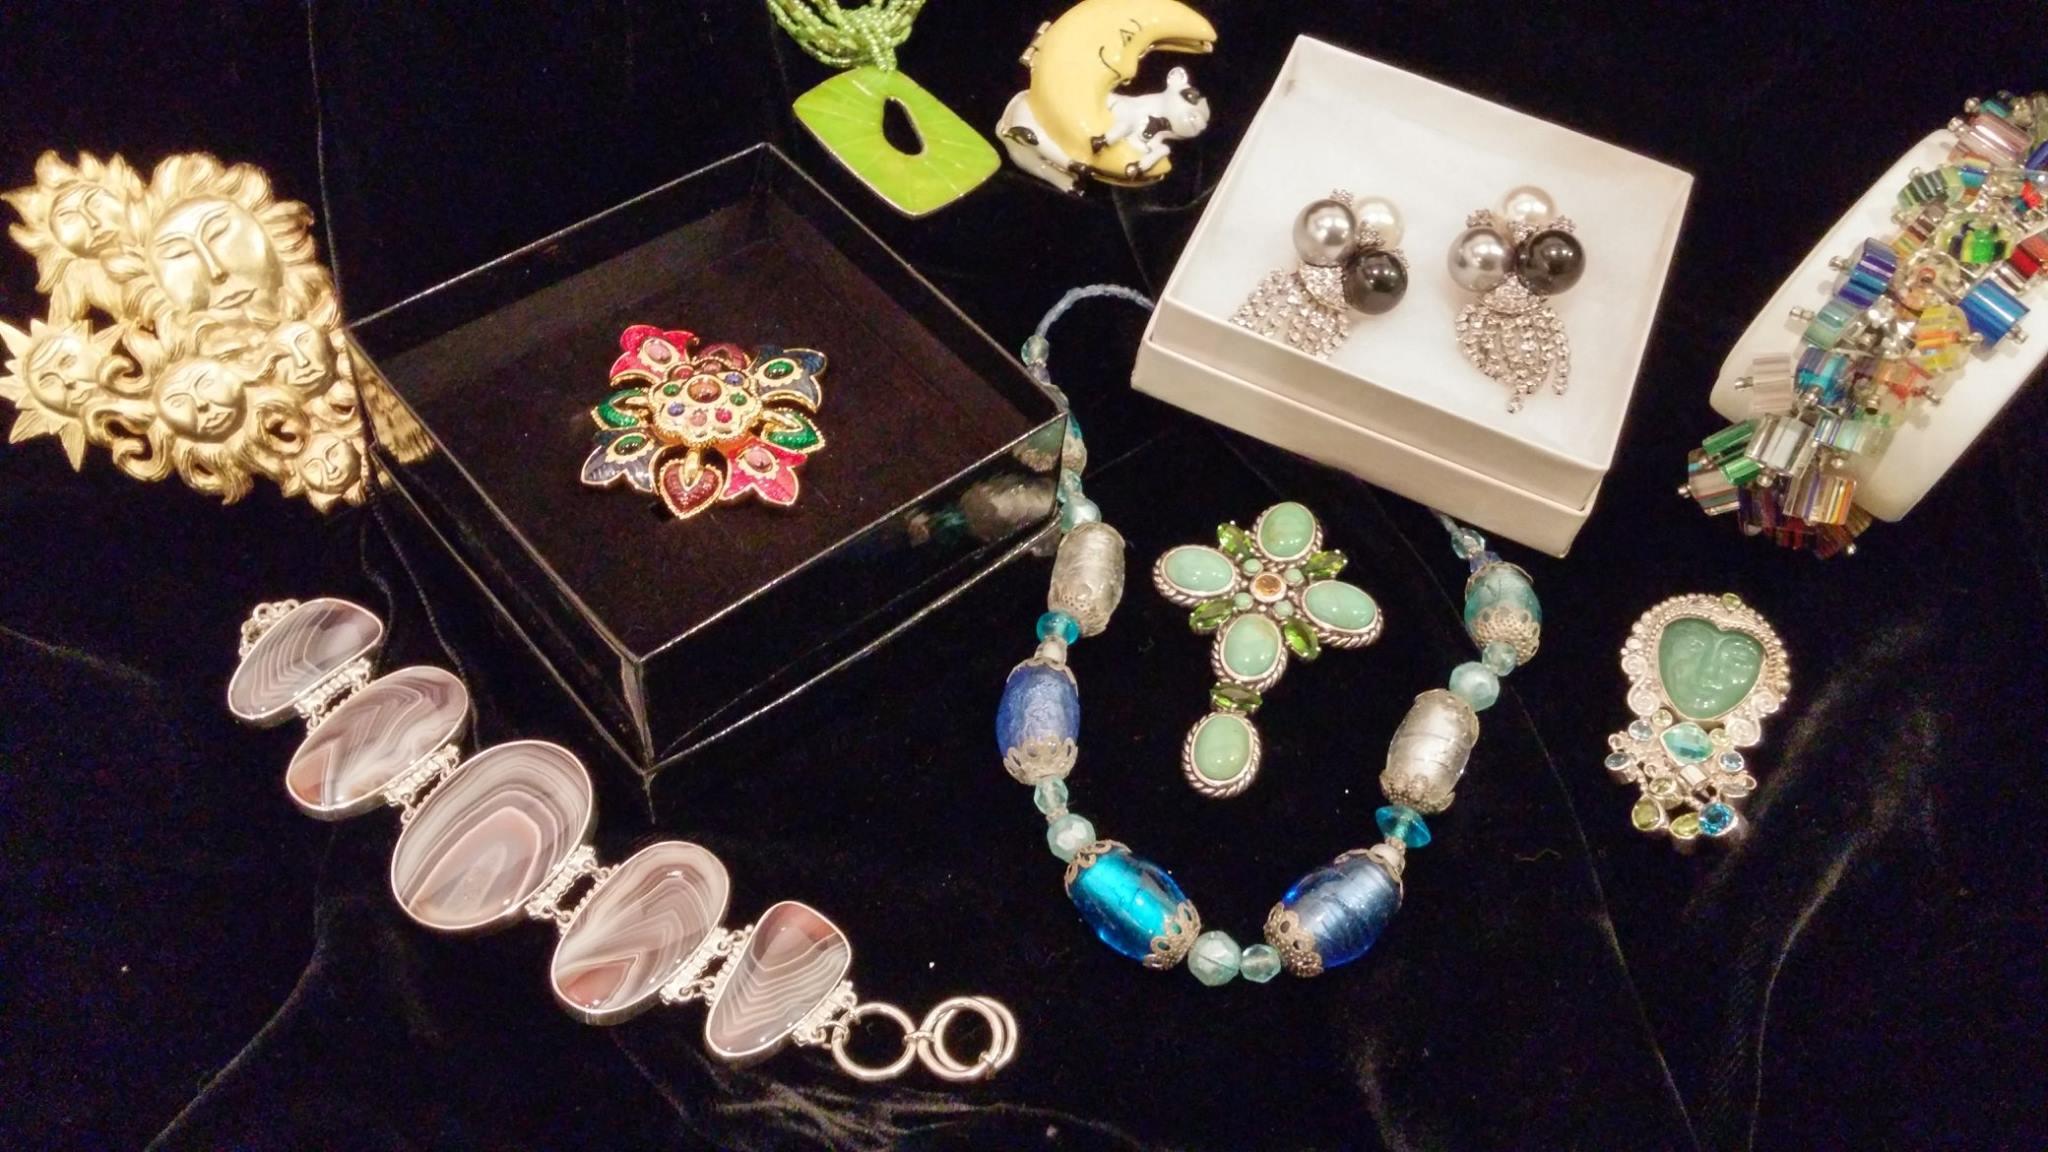 6th Annual Jewelry Sale